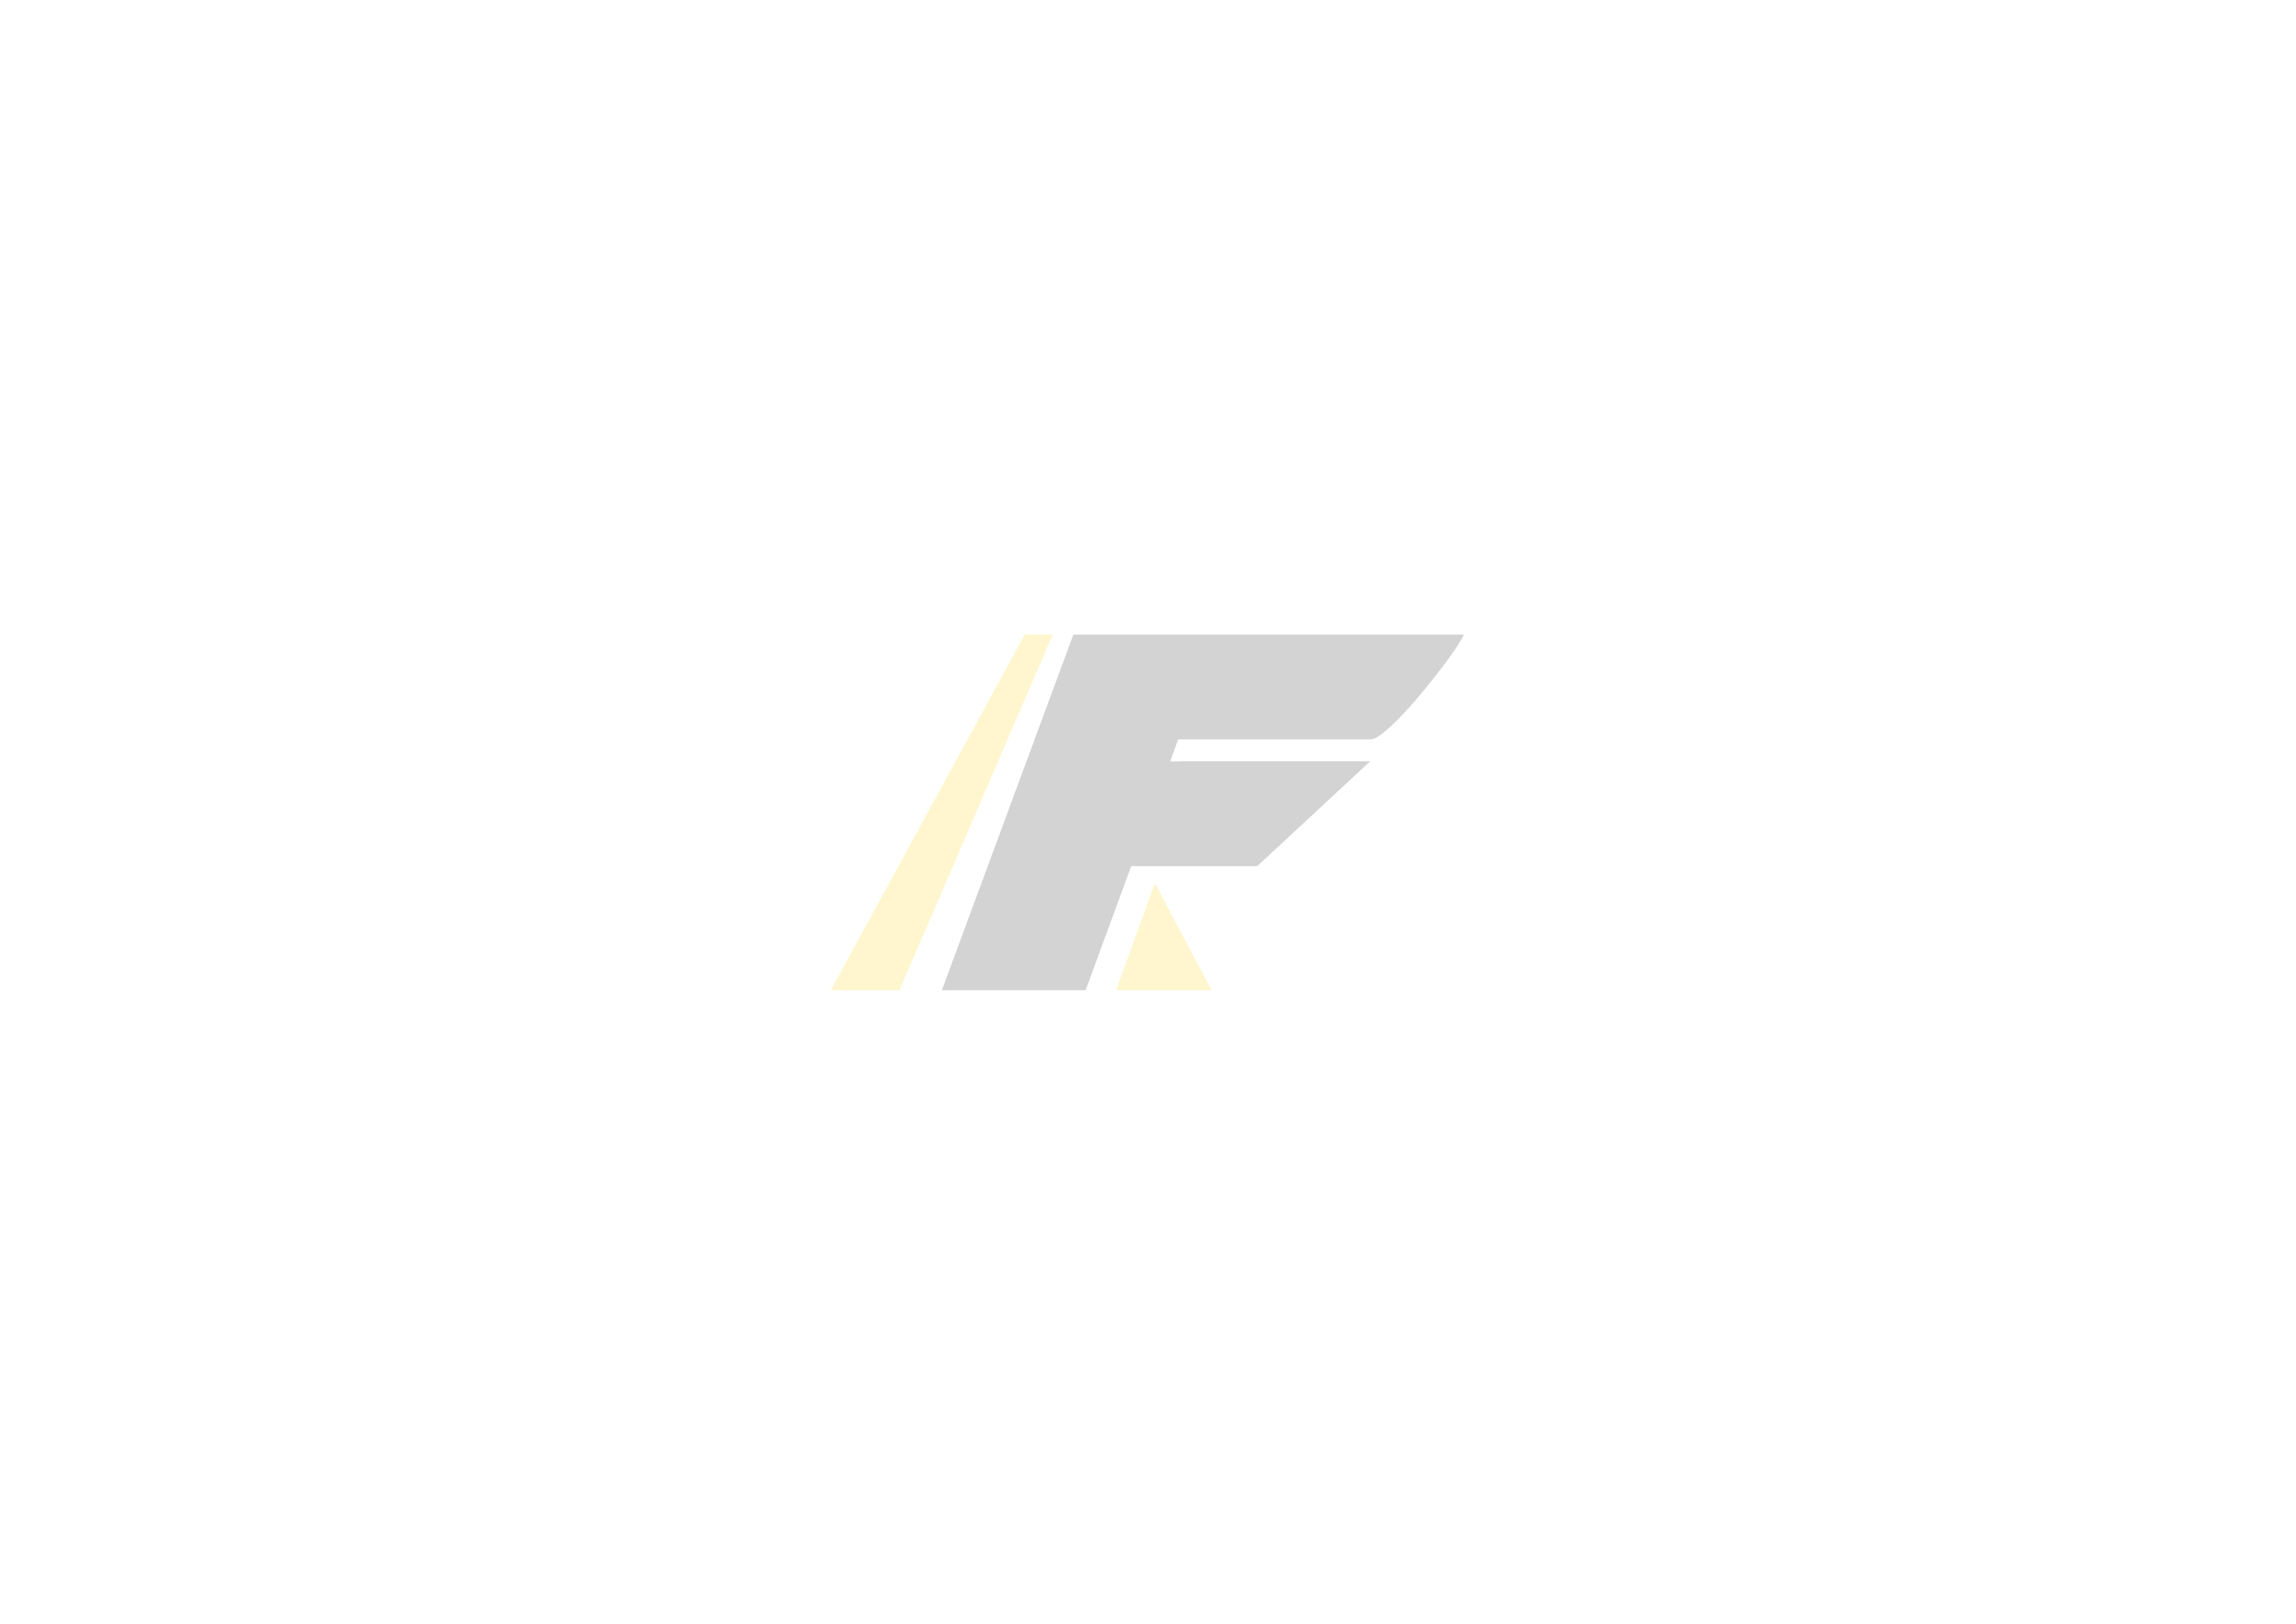 OXFORD Premium Sports Grips